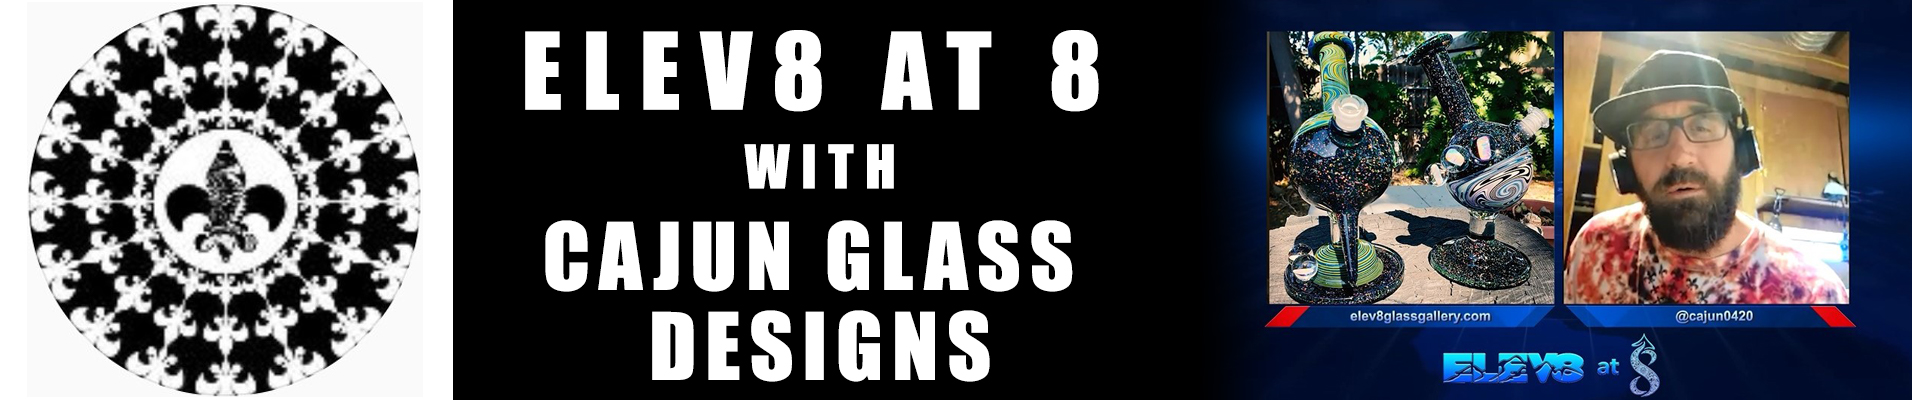 cajun-glass-designs-banner.jpg